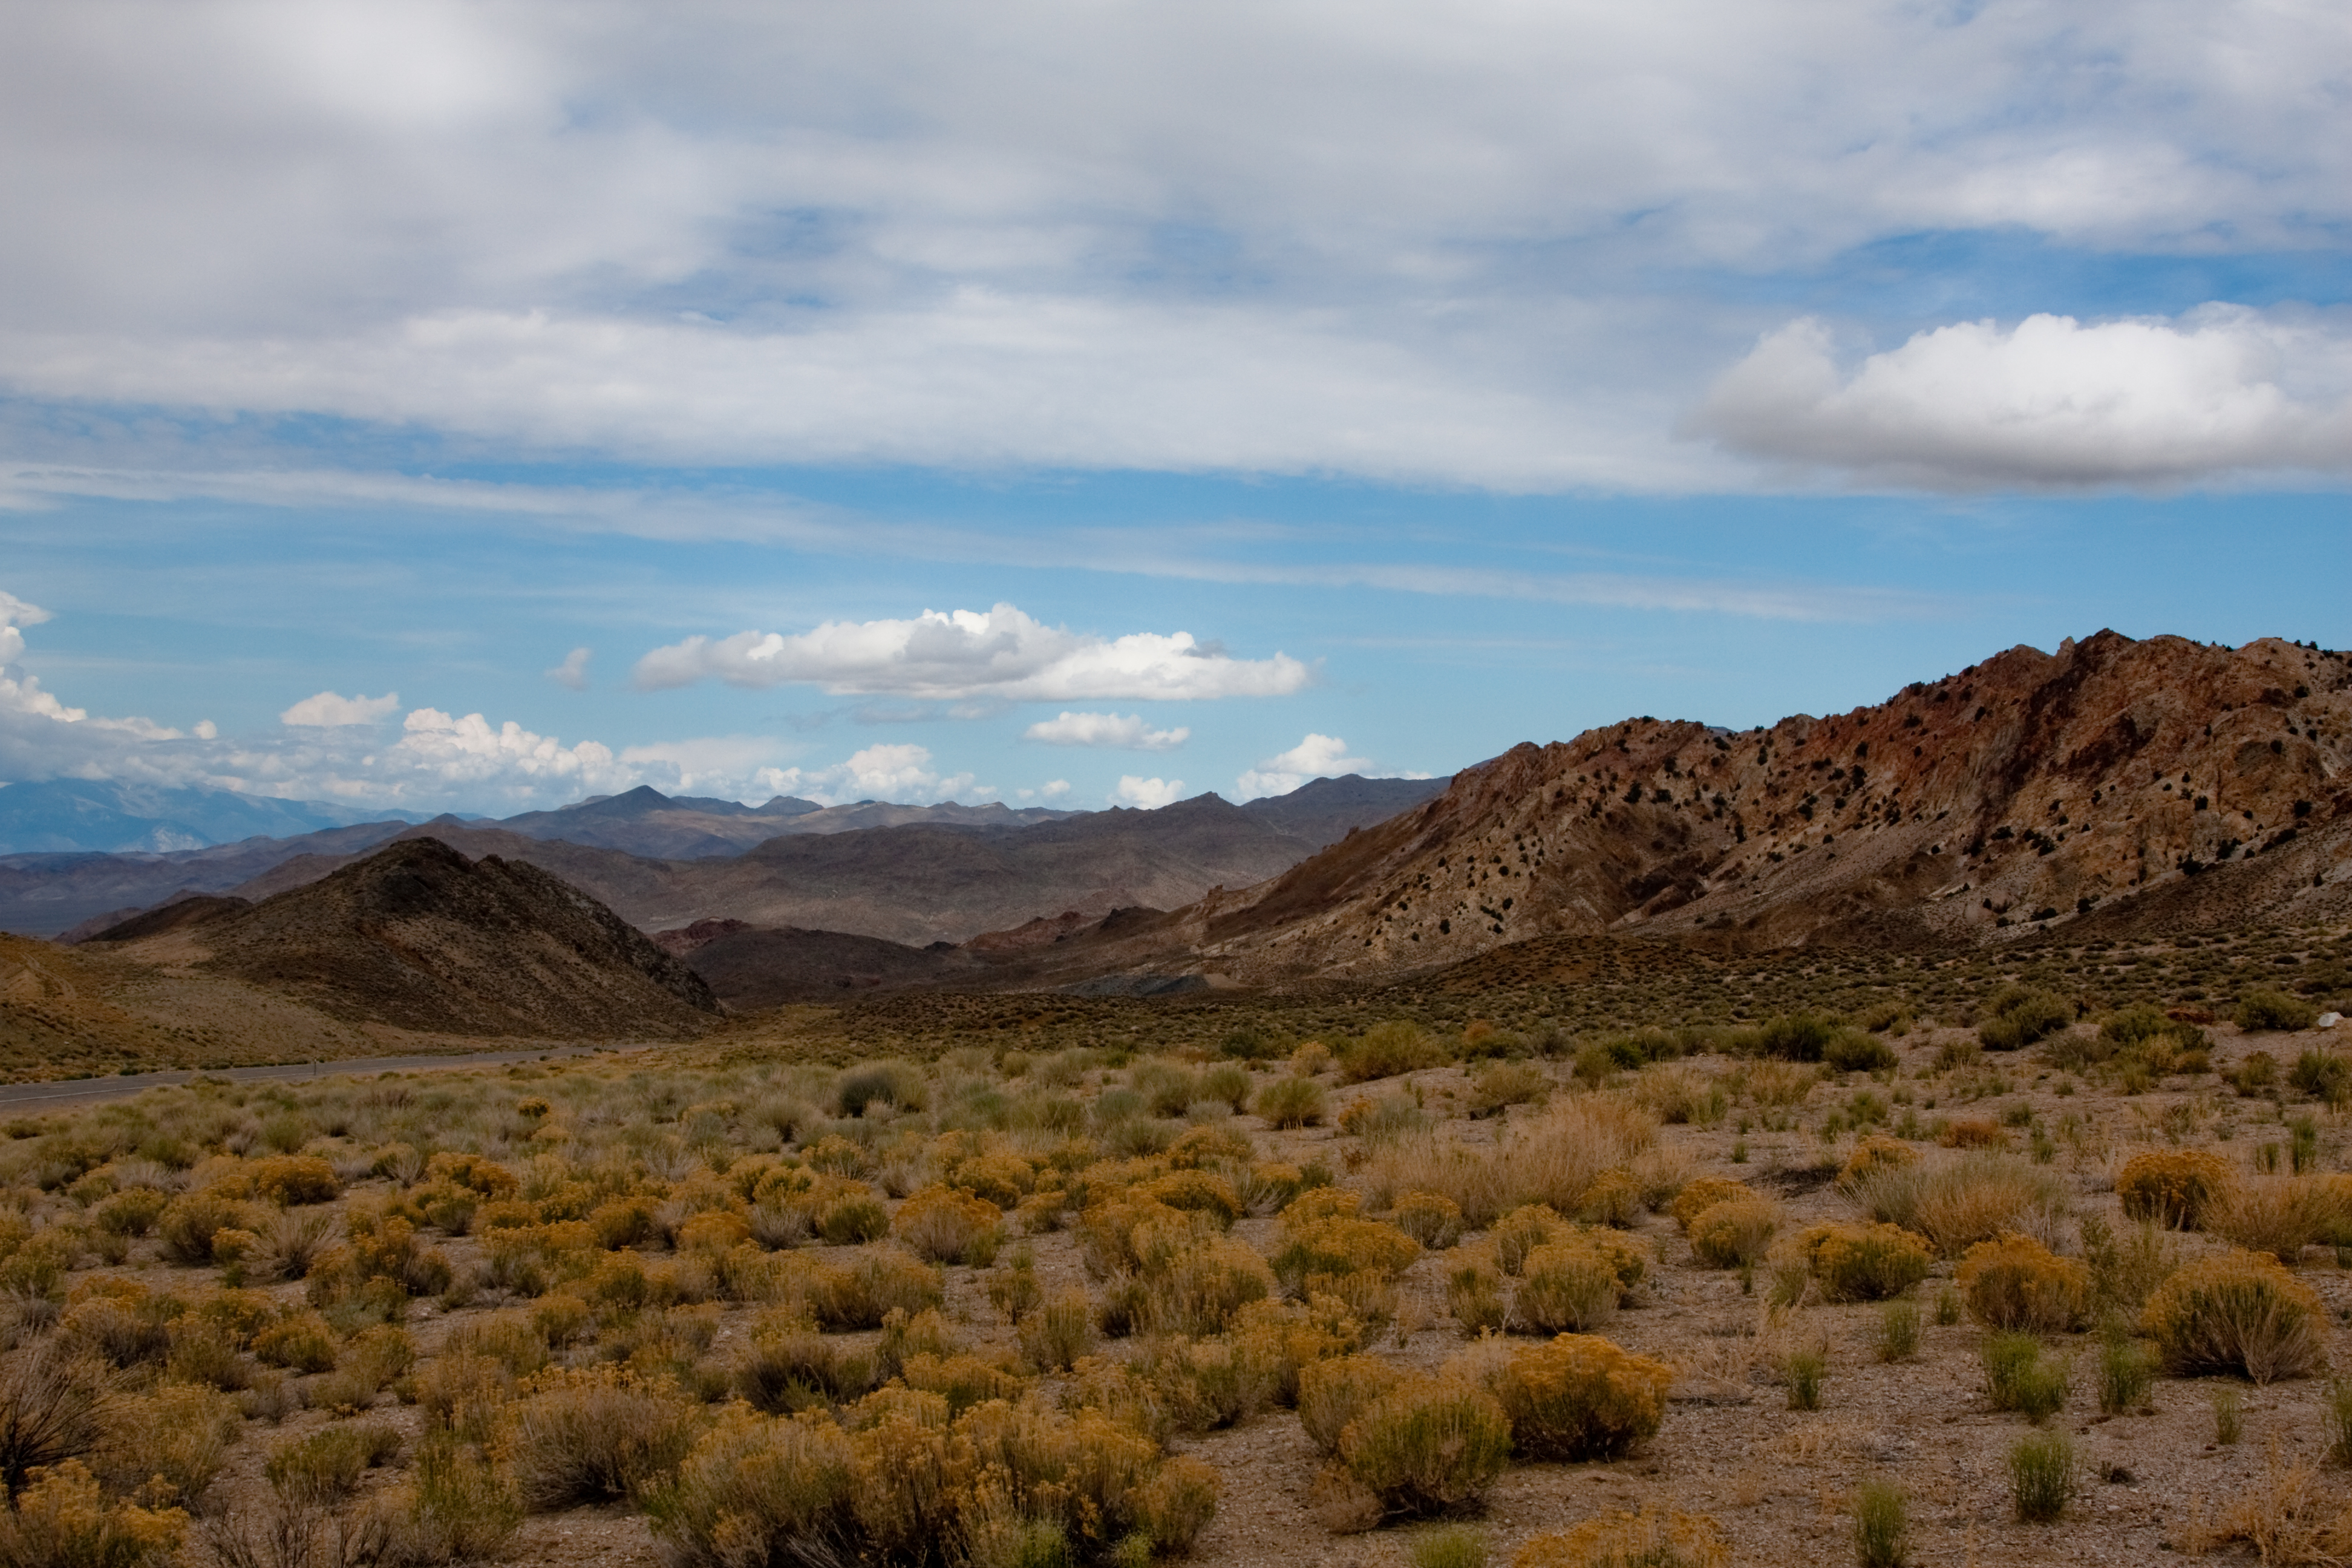 Elevation of Mount Ferguson, Mt Ferguson, Nevada, USA - Topographic ...